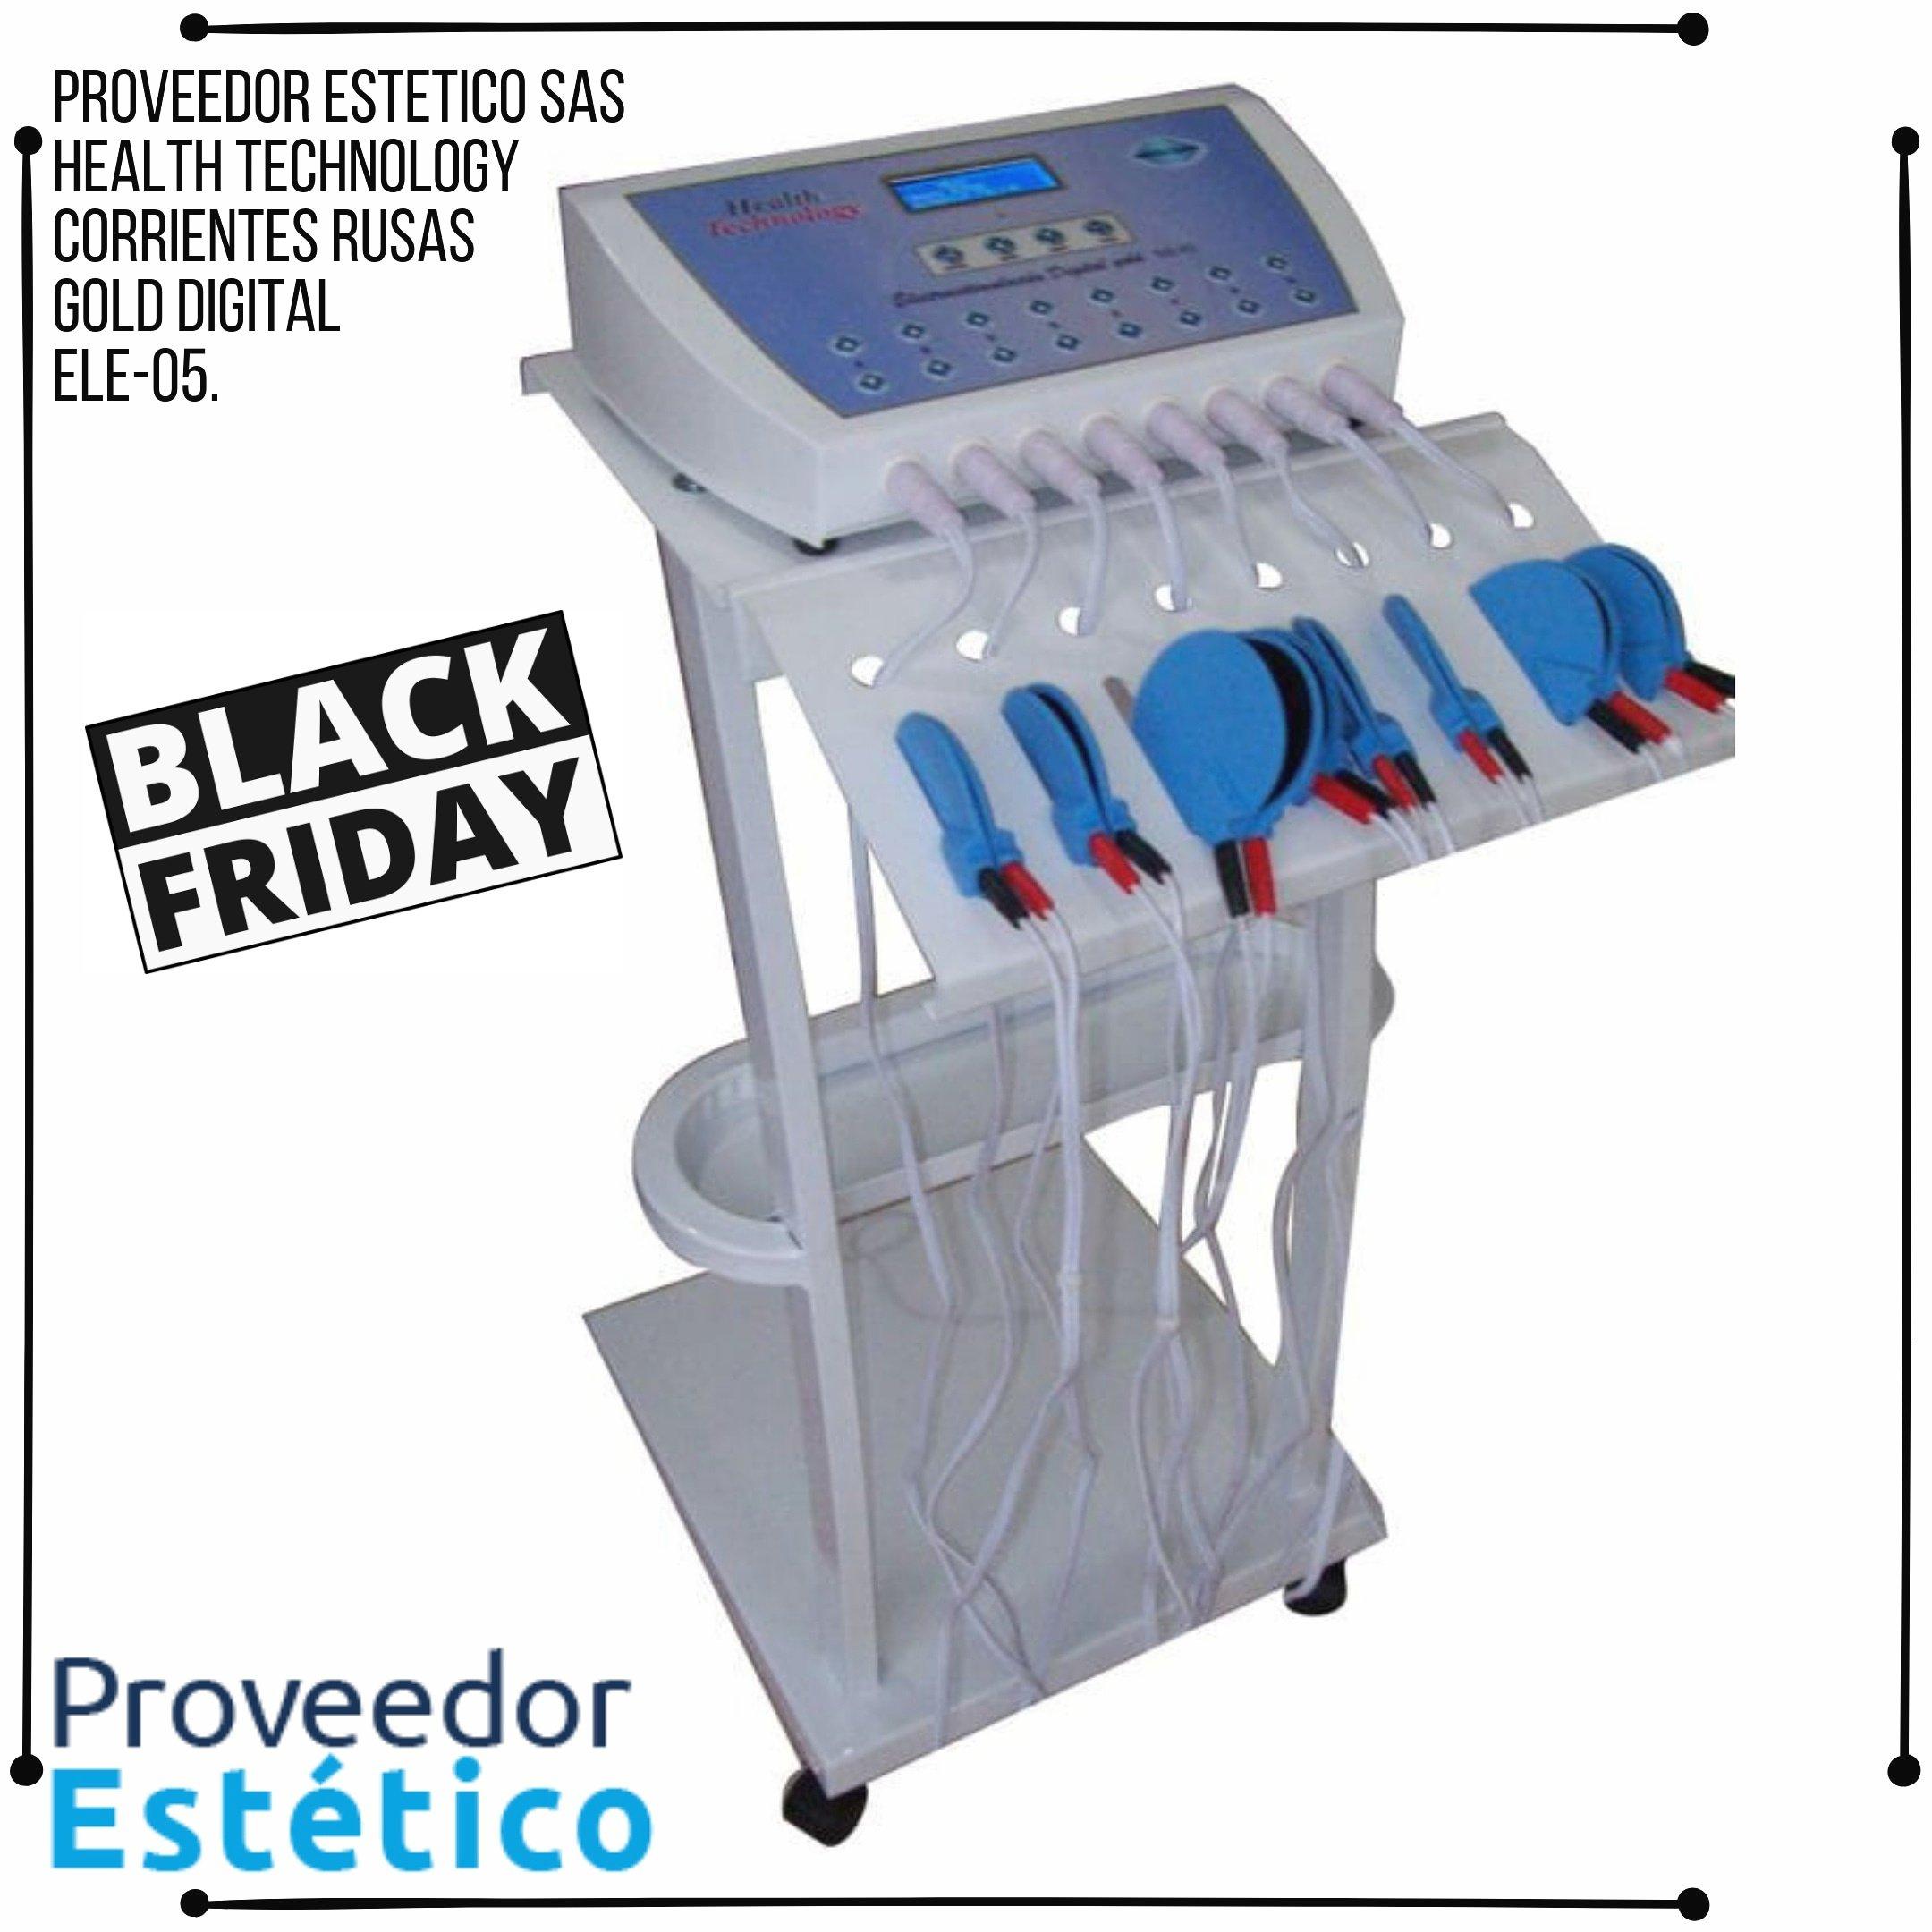 ELE-05 Corrientes Rusas Gold Health Tecnology.